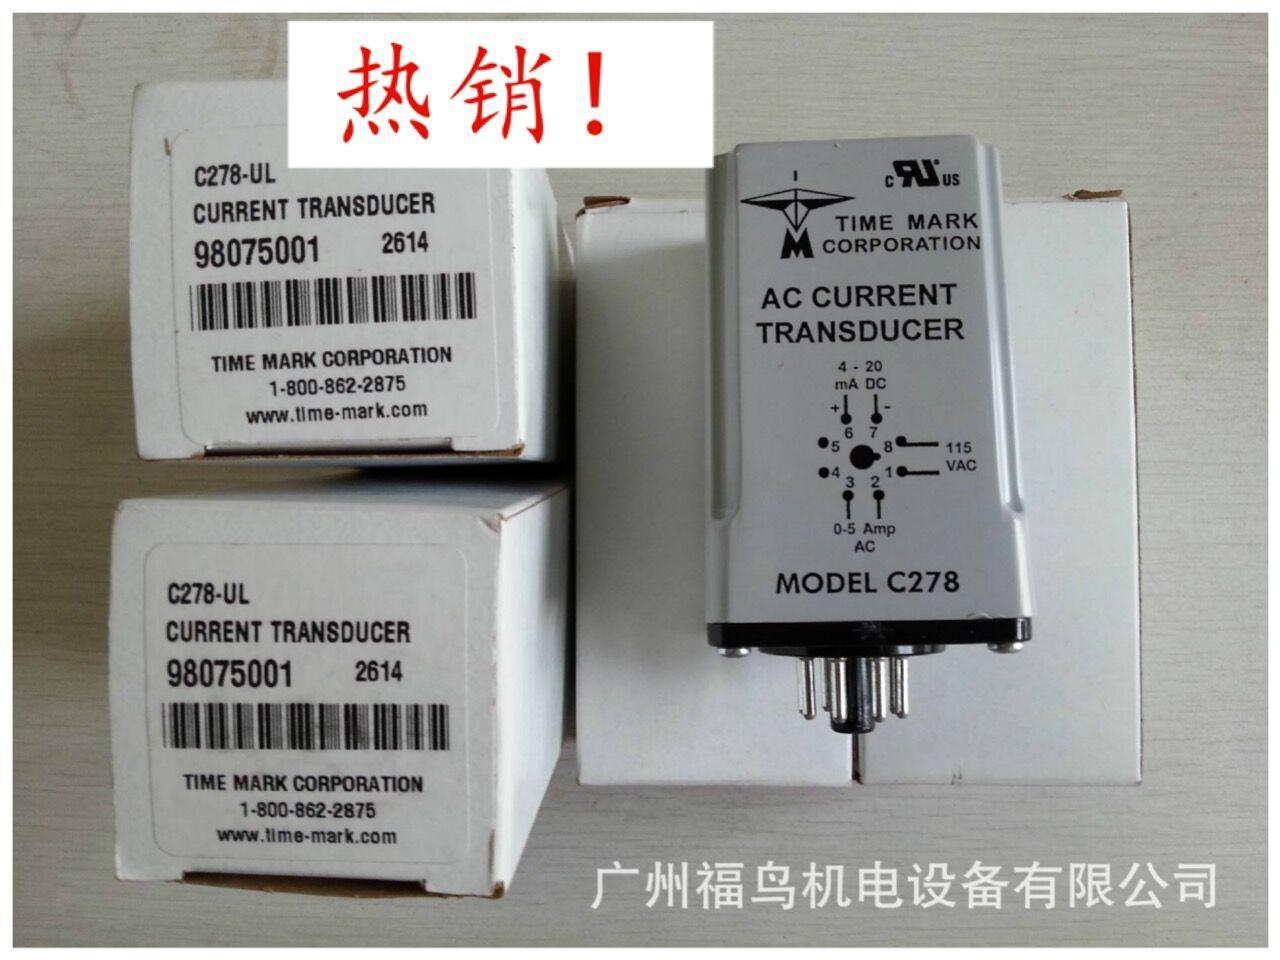 TIME MARK电流变送器, 型号: C278